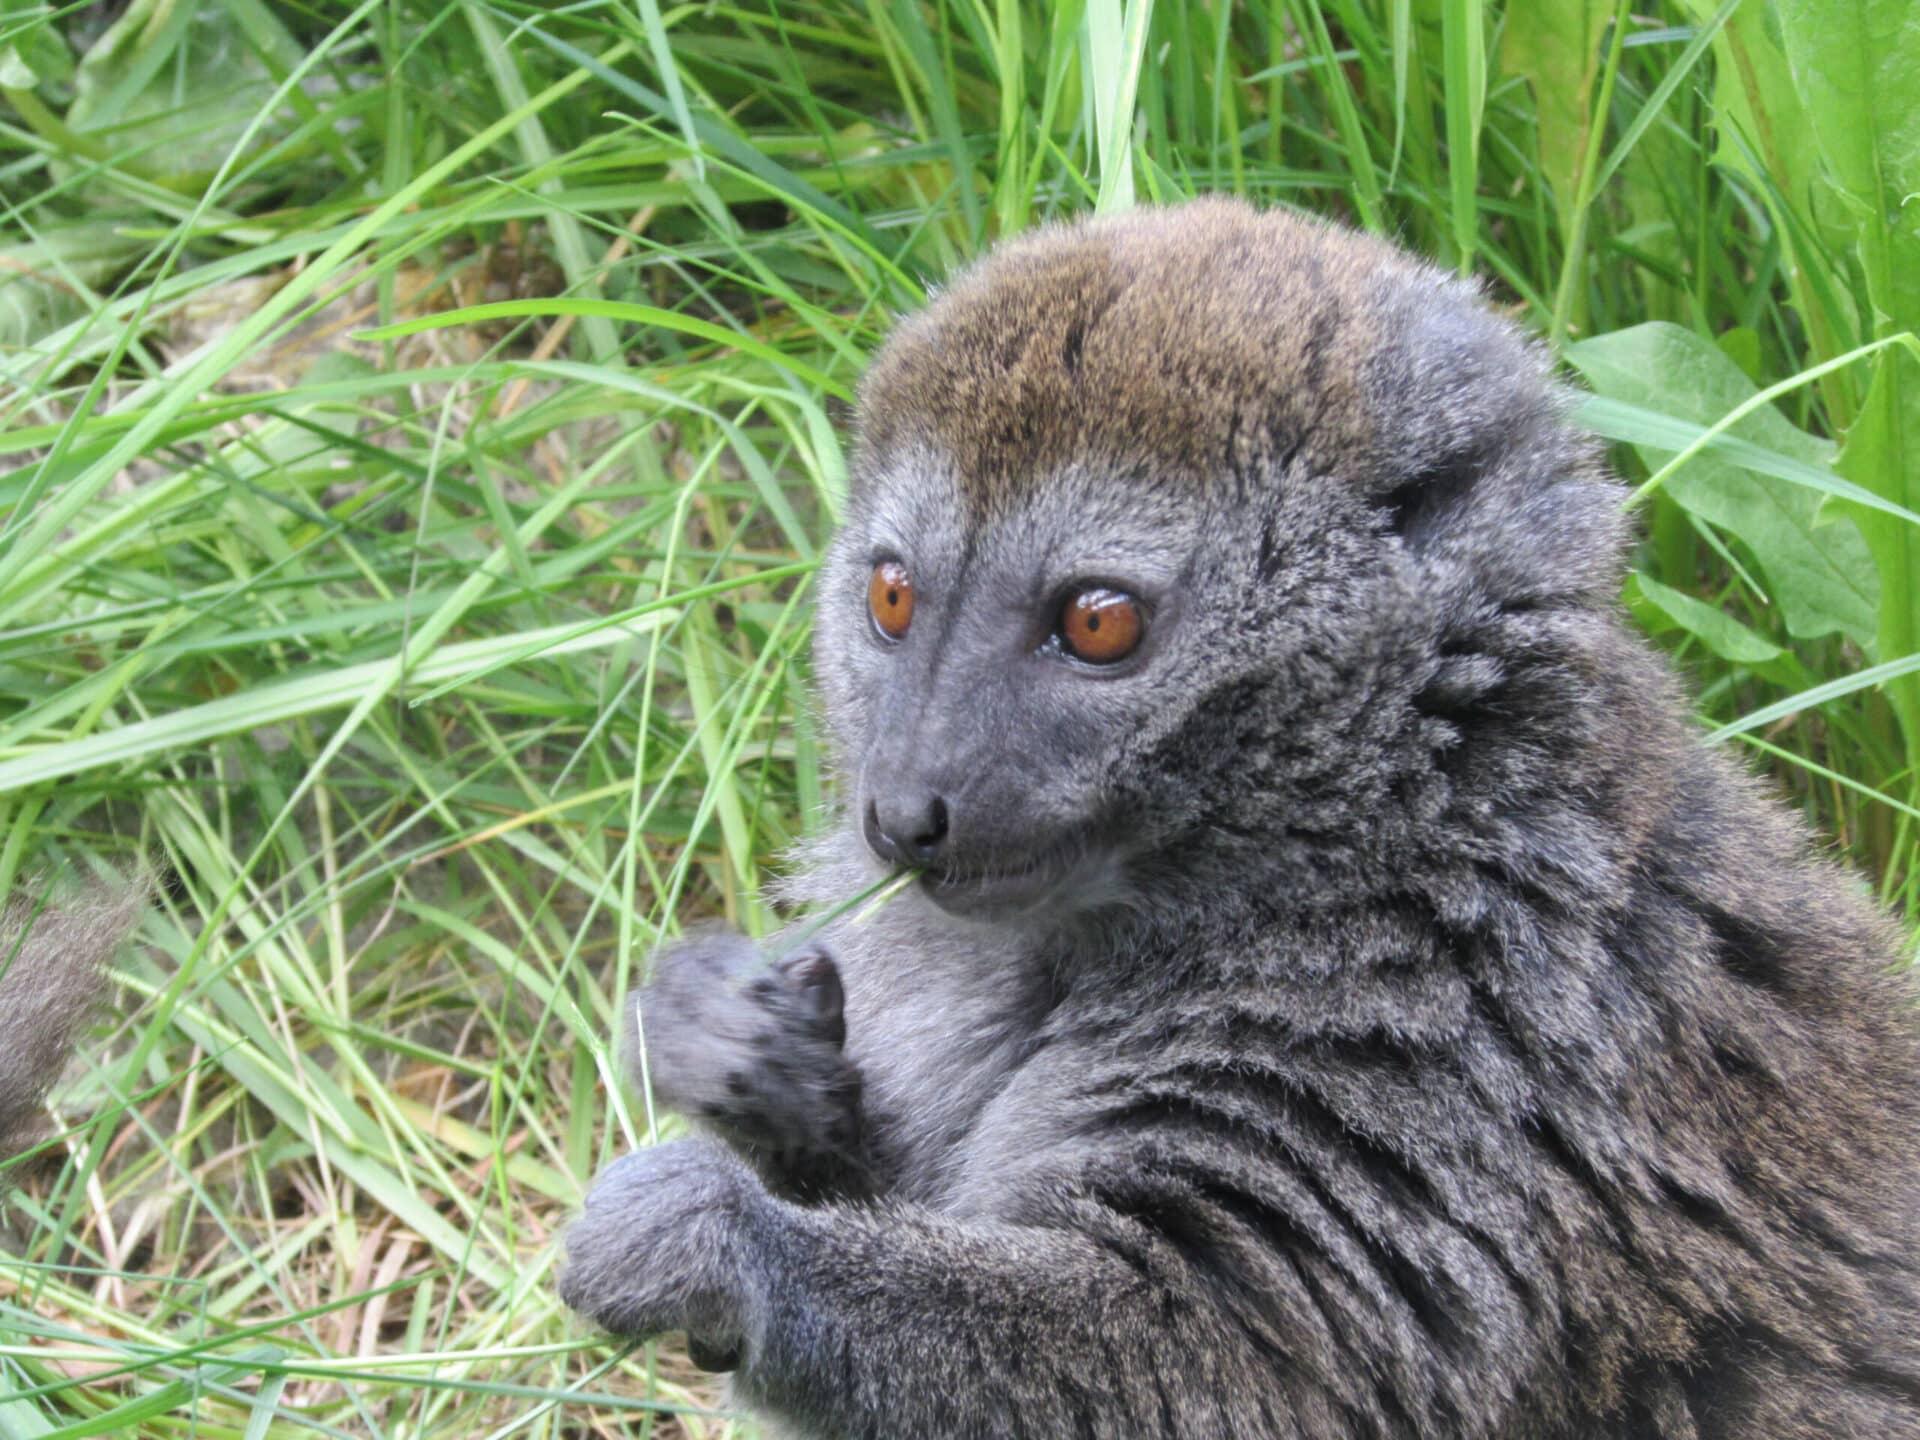 Alaotran reed lemur - Hapalemur alaotrensis at Marwell Zoo